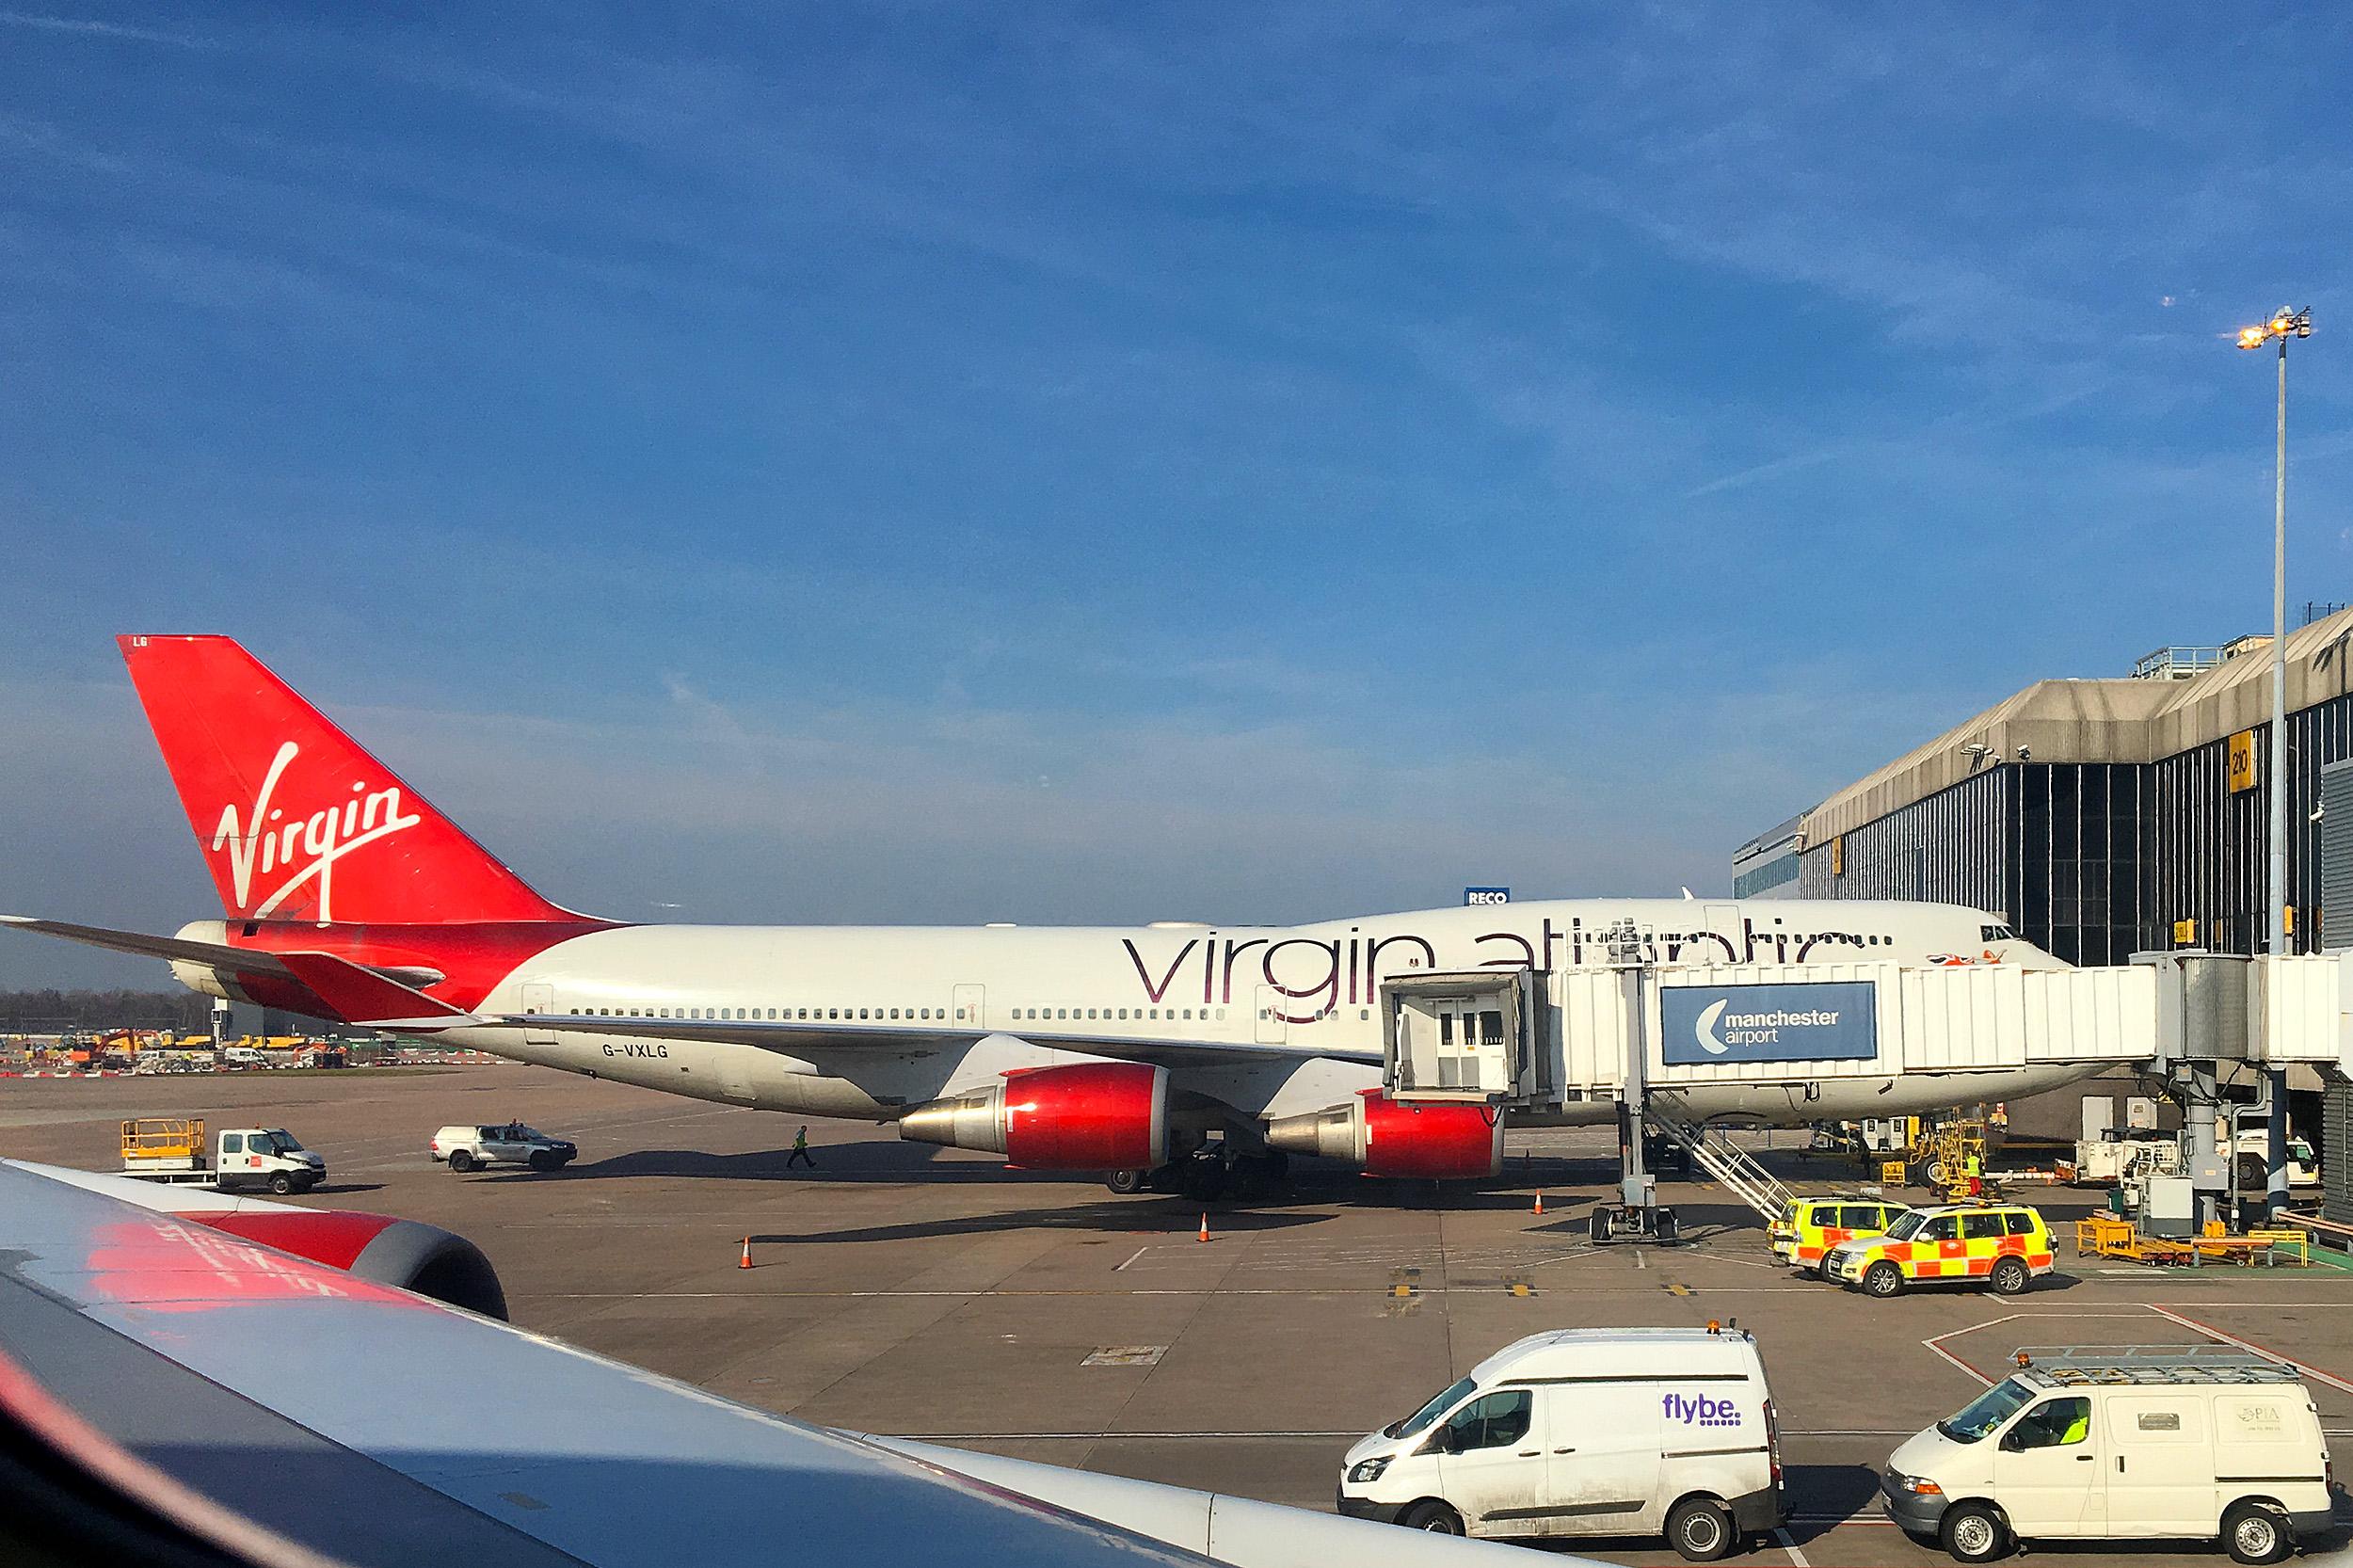 Virgin Atlantic Manchester Airport